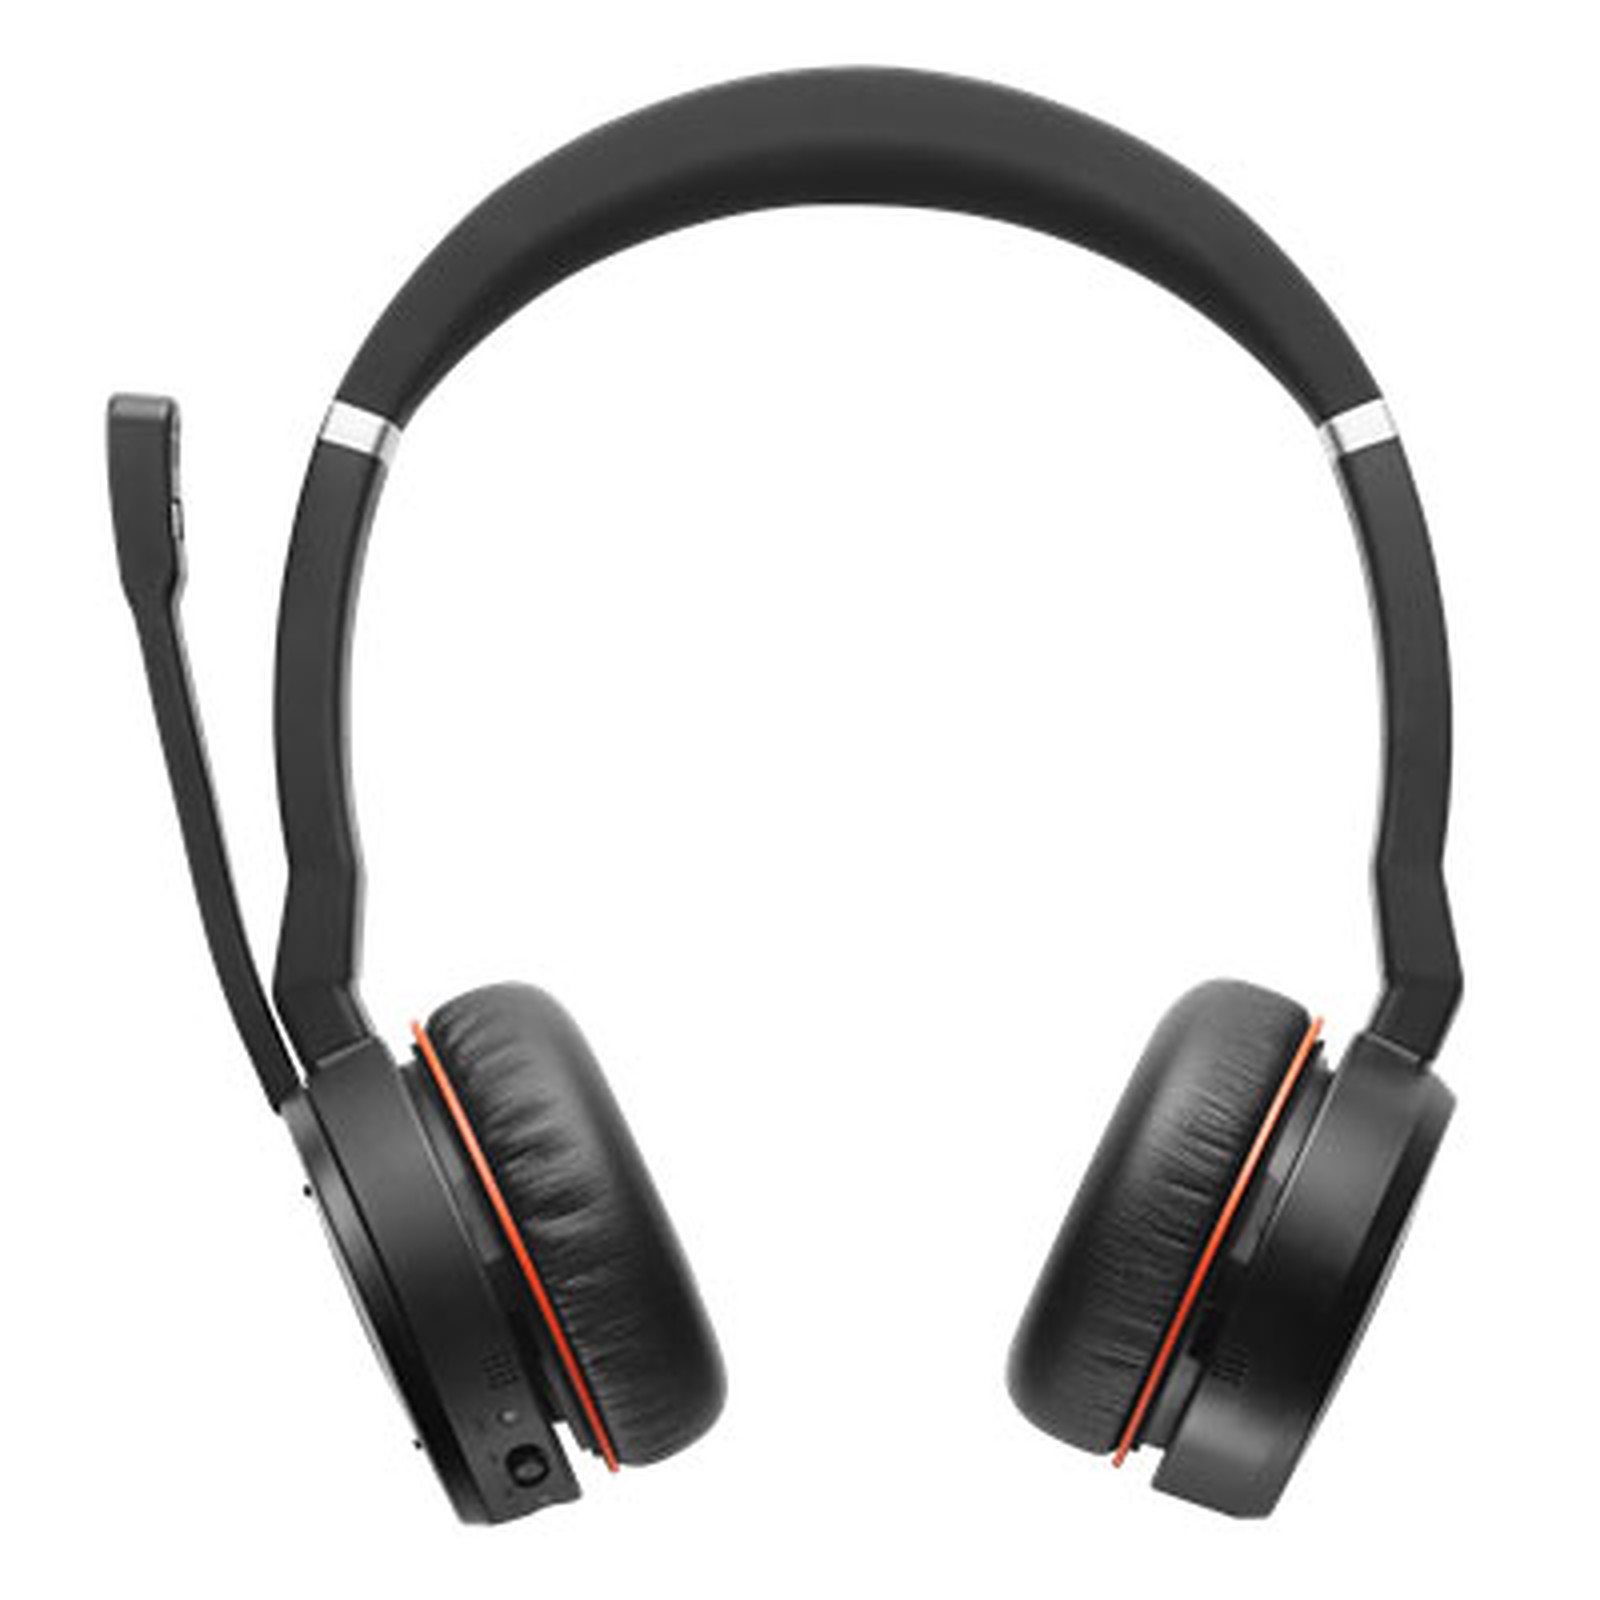 Jabra Evolve 75 Ms Stereo: Jabra Evolve 75 MS Stéréo Charging